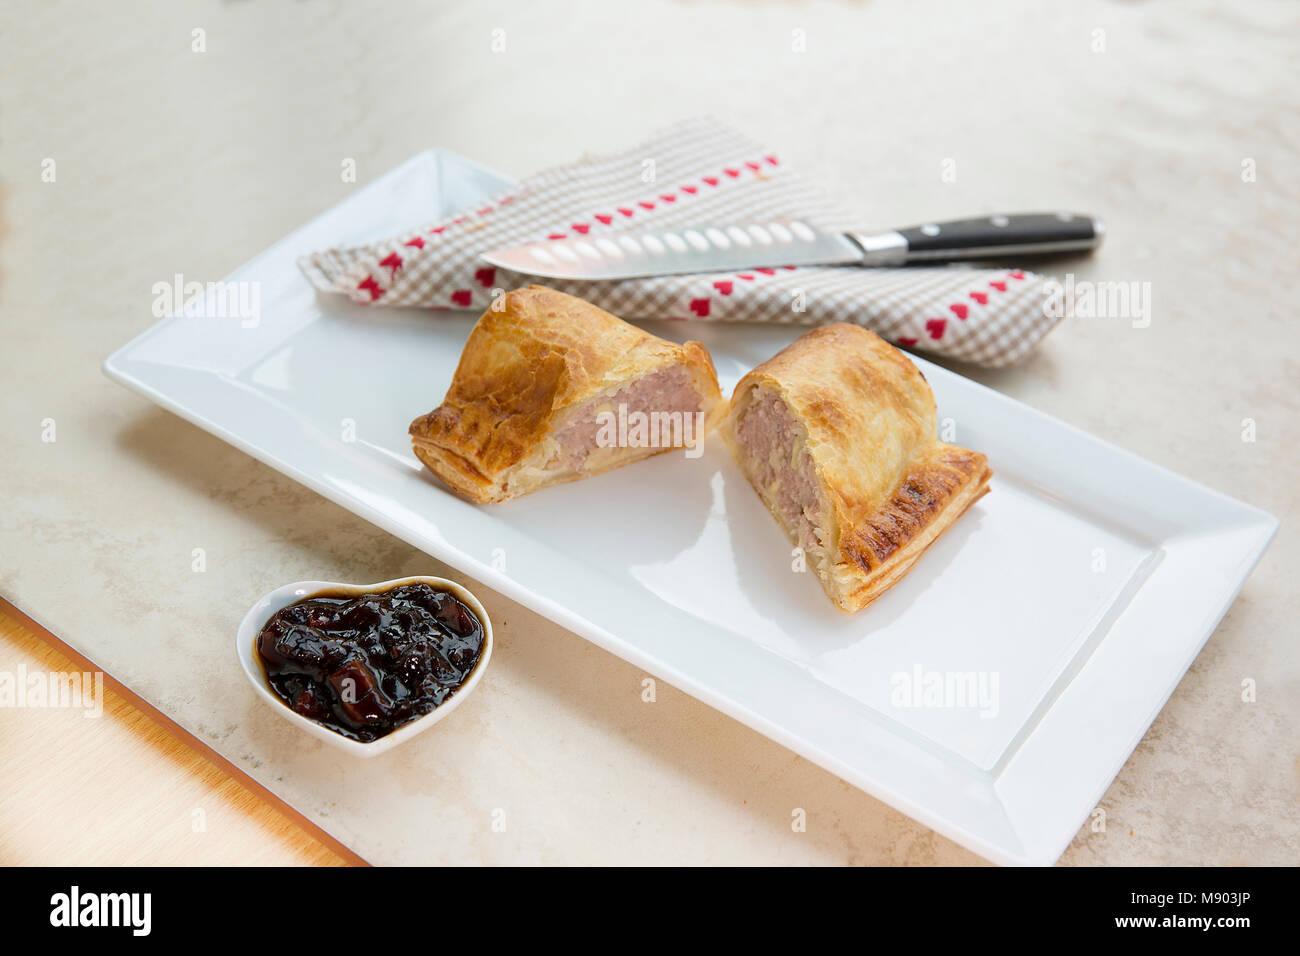 Pork and Apple Sausage Roll - Stock Image